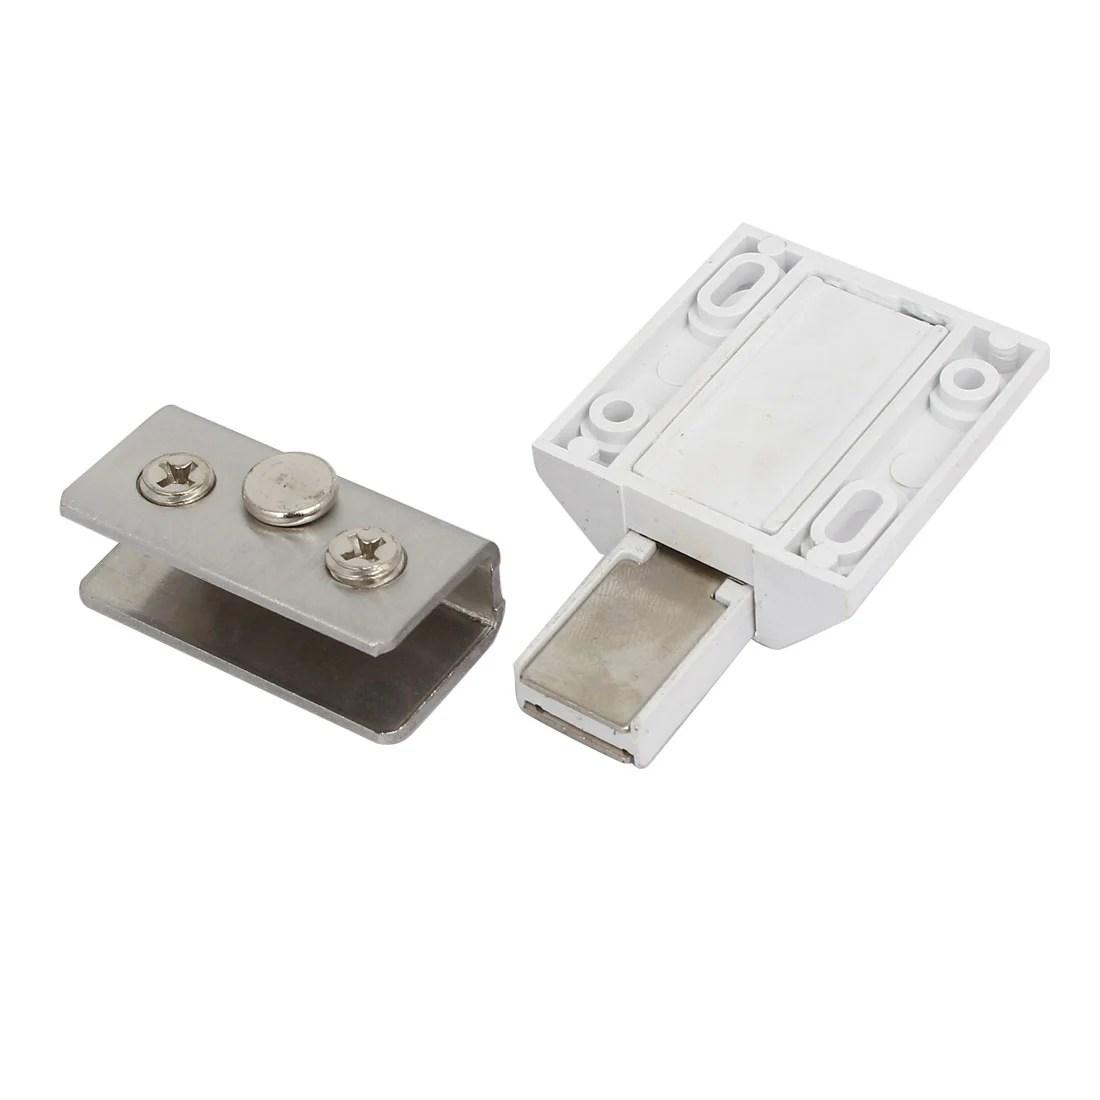 Cabinet Shower Door Pivot Hinge Magnetic Catch Latch Glass Clamps Set